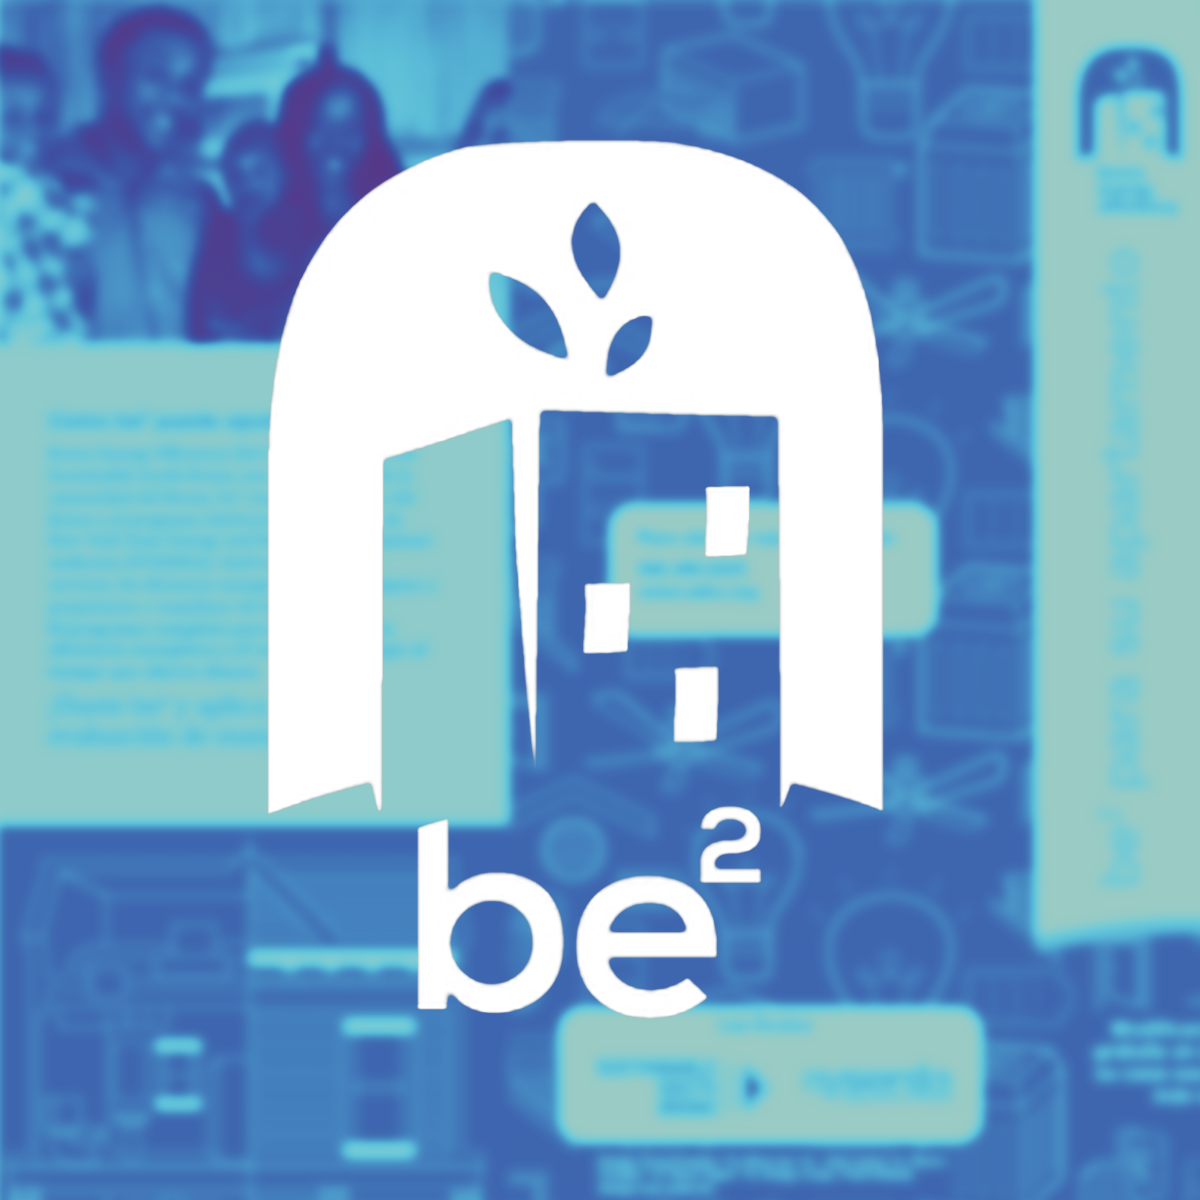 Bronx energy efficiency - Branding / Print / Marketing